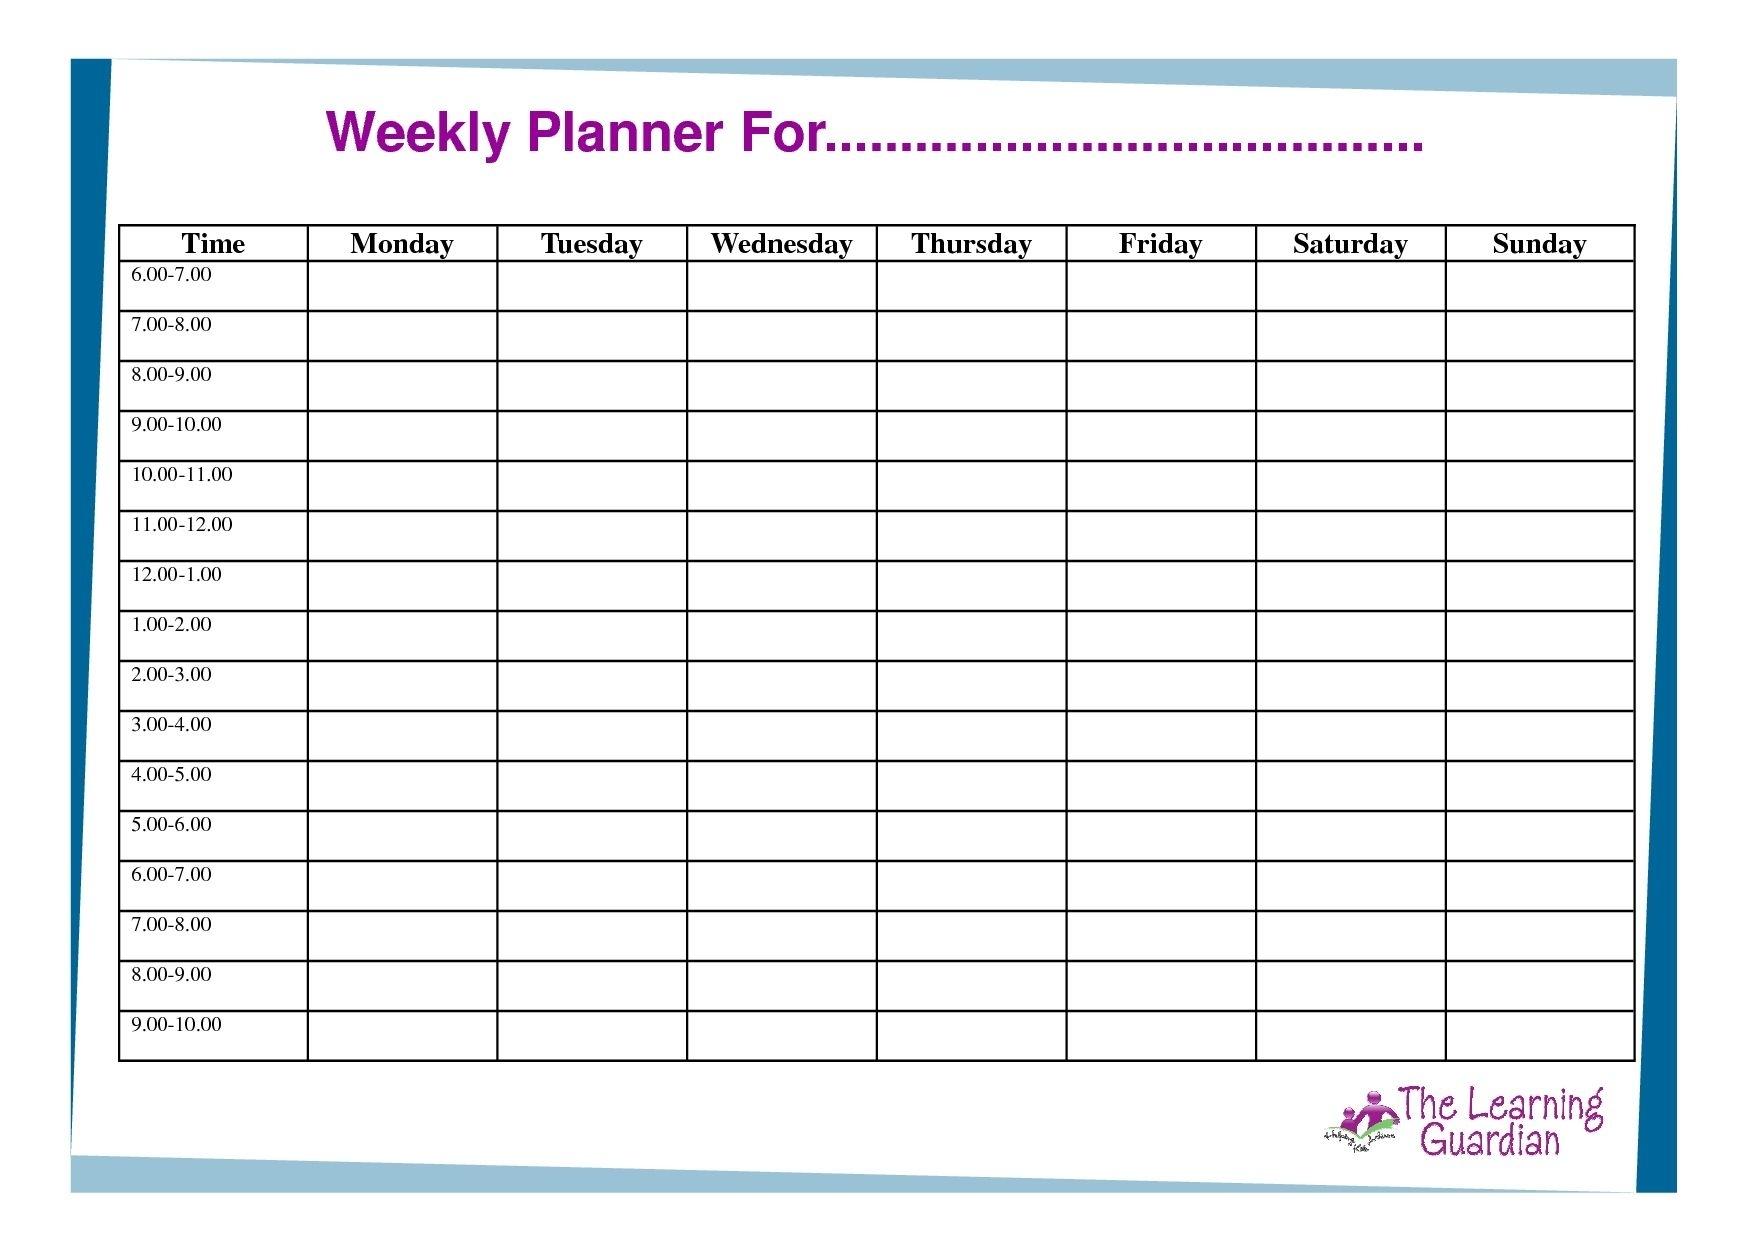 Day Planner E Free Meal Excel Word Schedule Printable Weekly regarding 7 Day Weekly Planner Template Printable